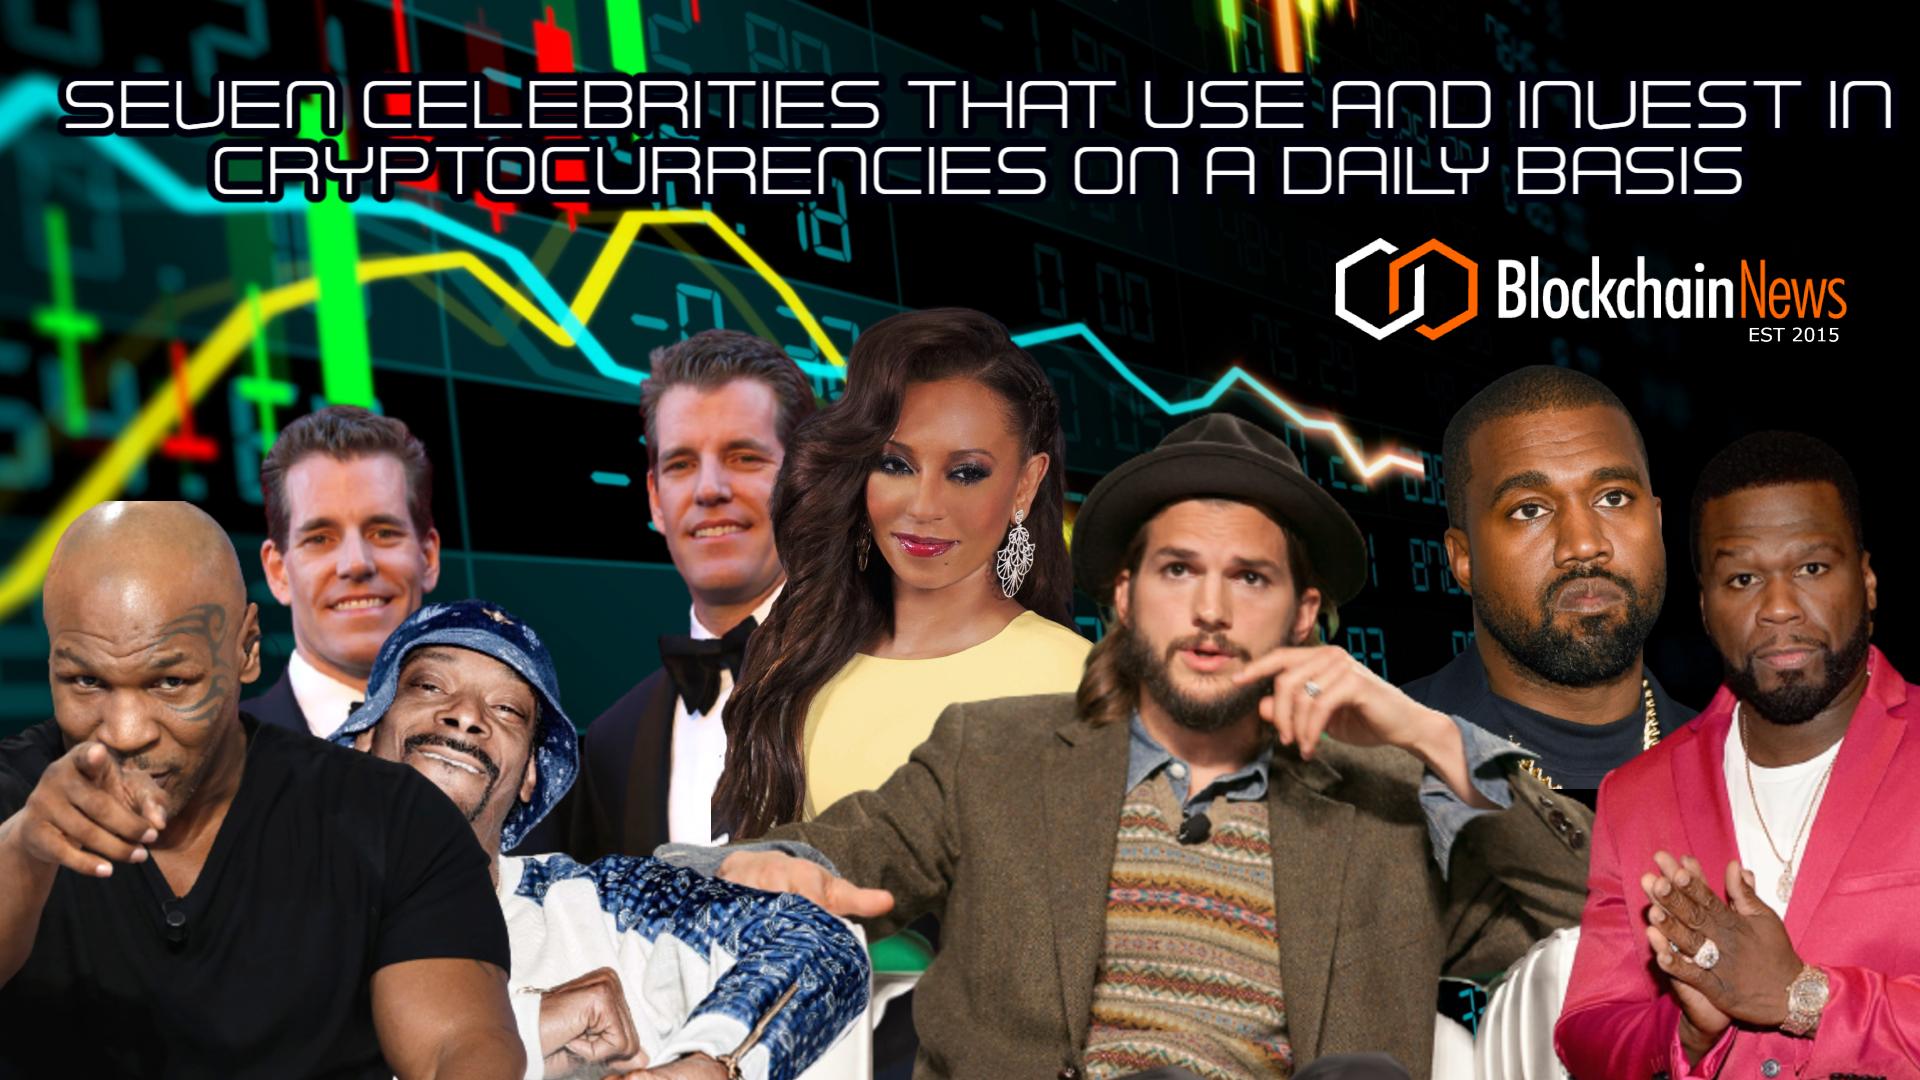 Ashton Kutcher, Cameron and Tyler Winklevoss, 50 Cent, Kanye West, Snoop Dogg, Mel Brown, Myke Tyson